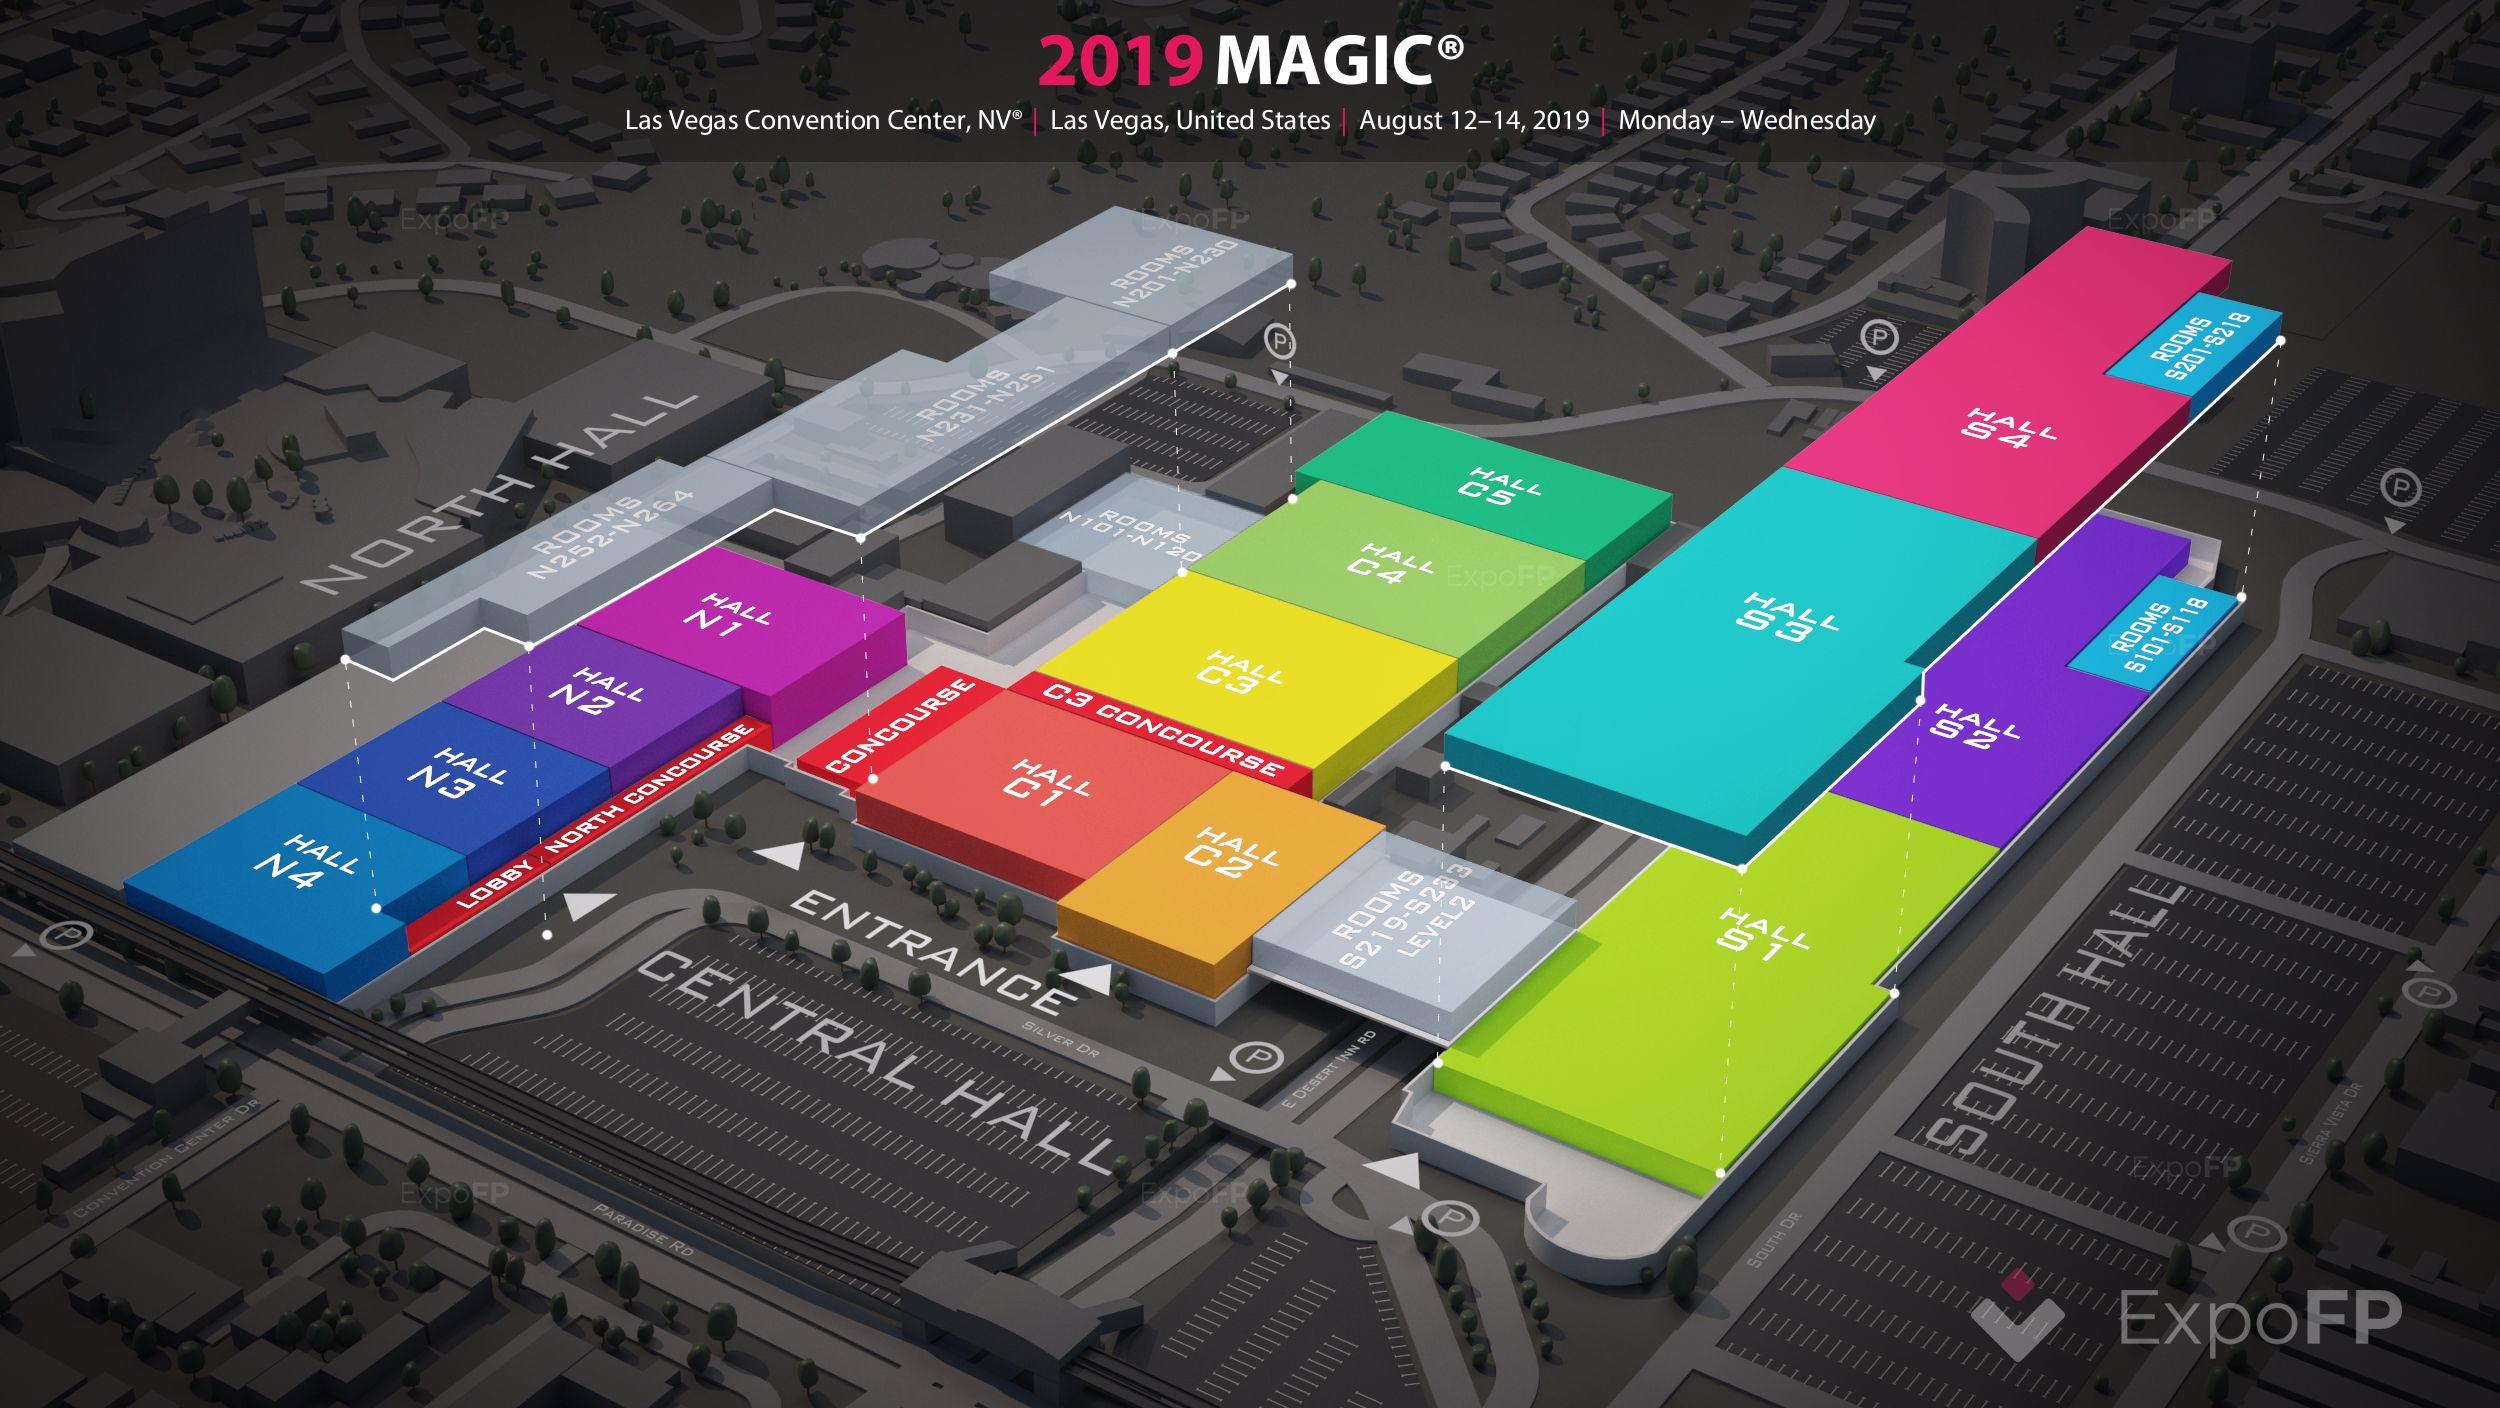 Las Vegas Convention Center Calendar 2022.Magic 2019 In Las Vegas Convention Center Nv